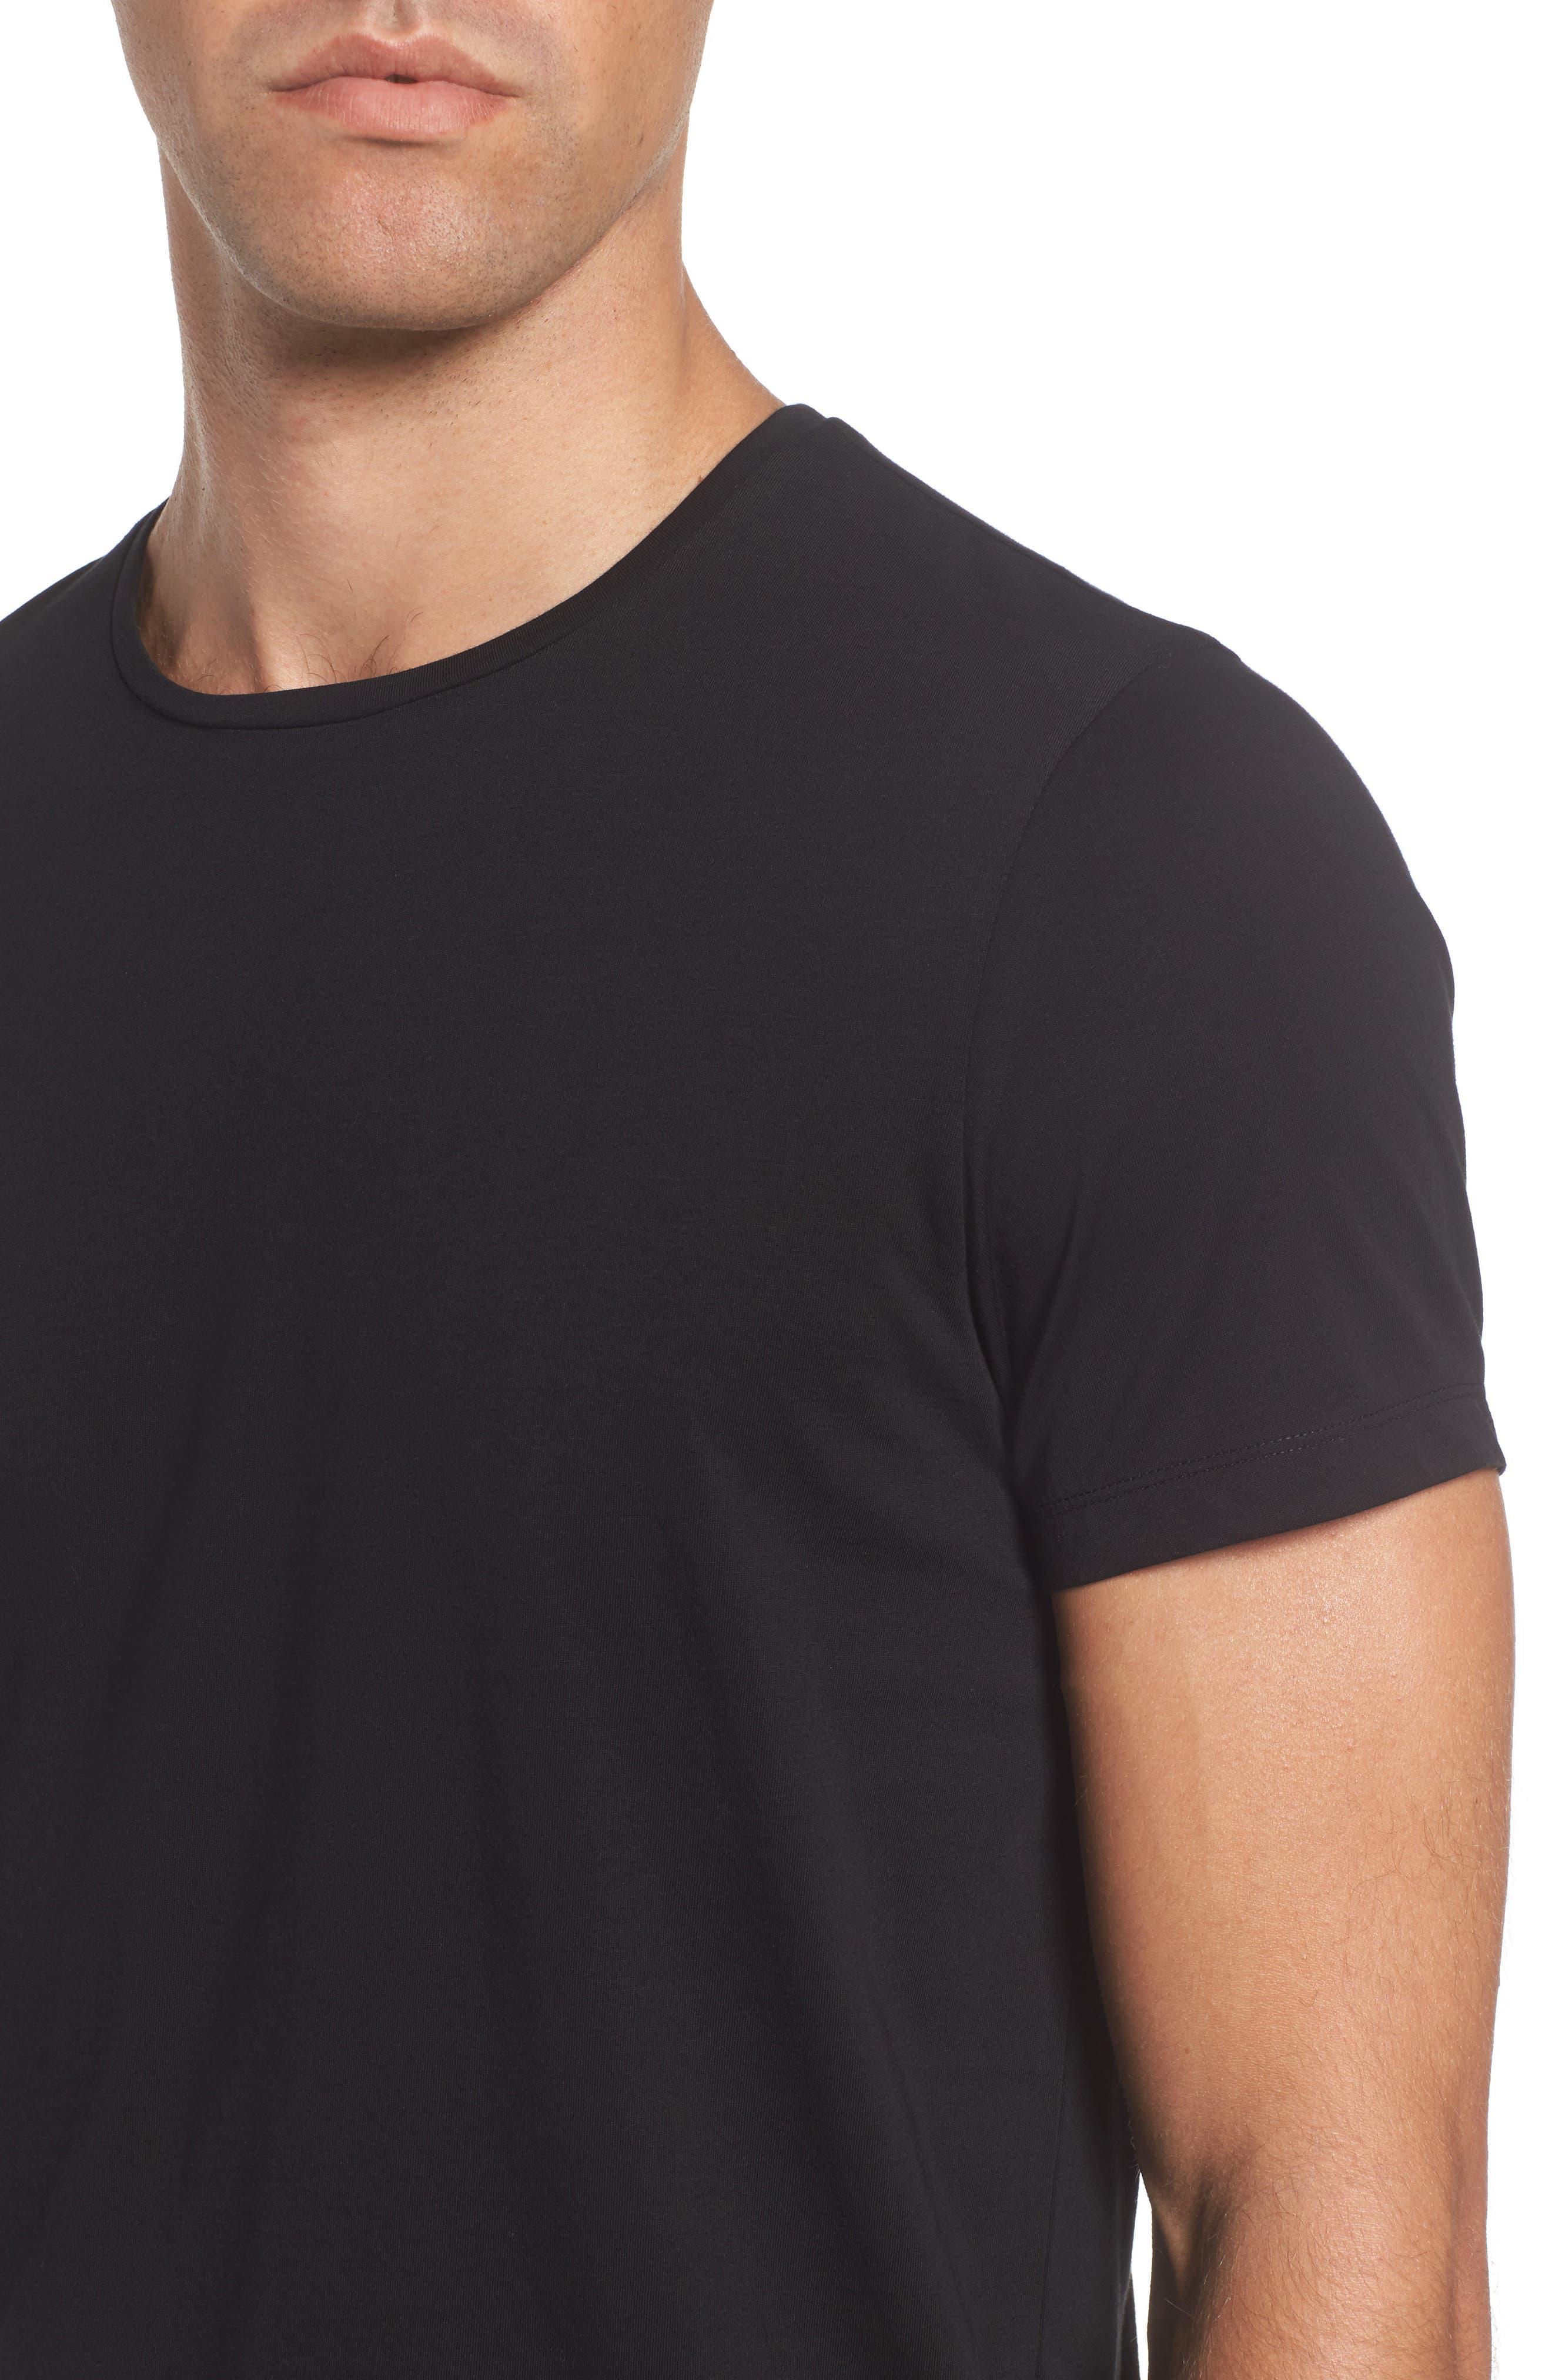 Tessler Crewneck T-Shirt,                             Alternate thumbnail 14, color,                             Black